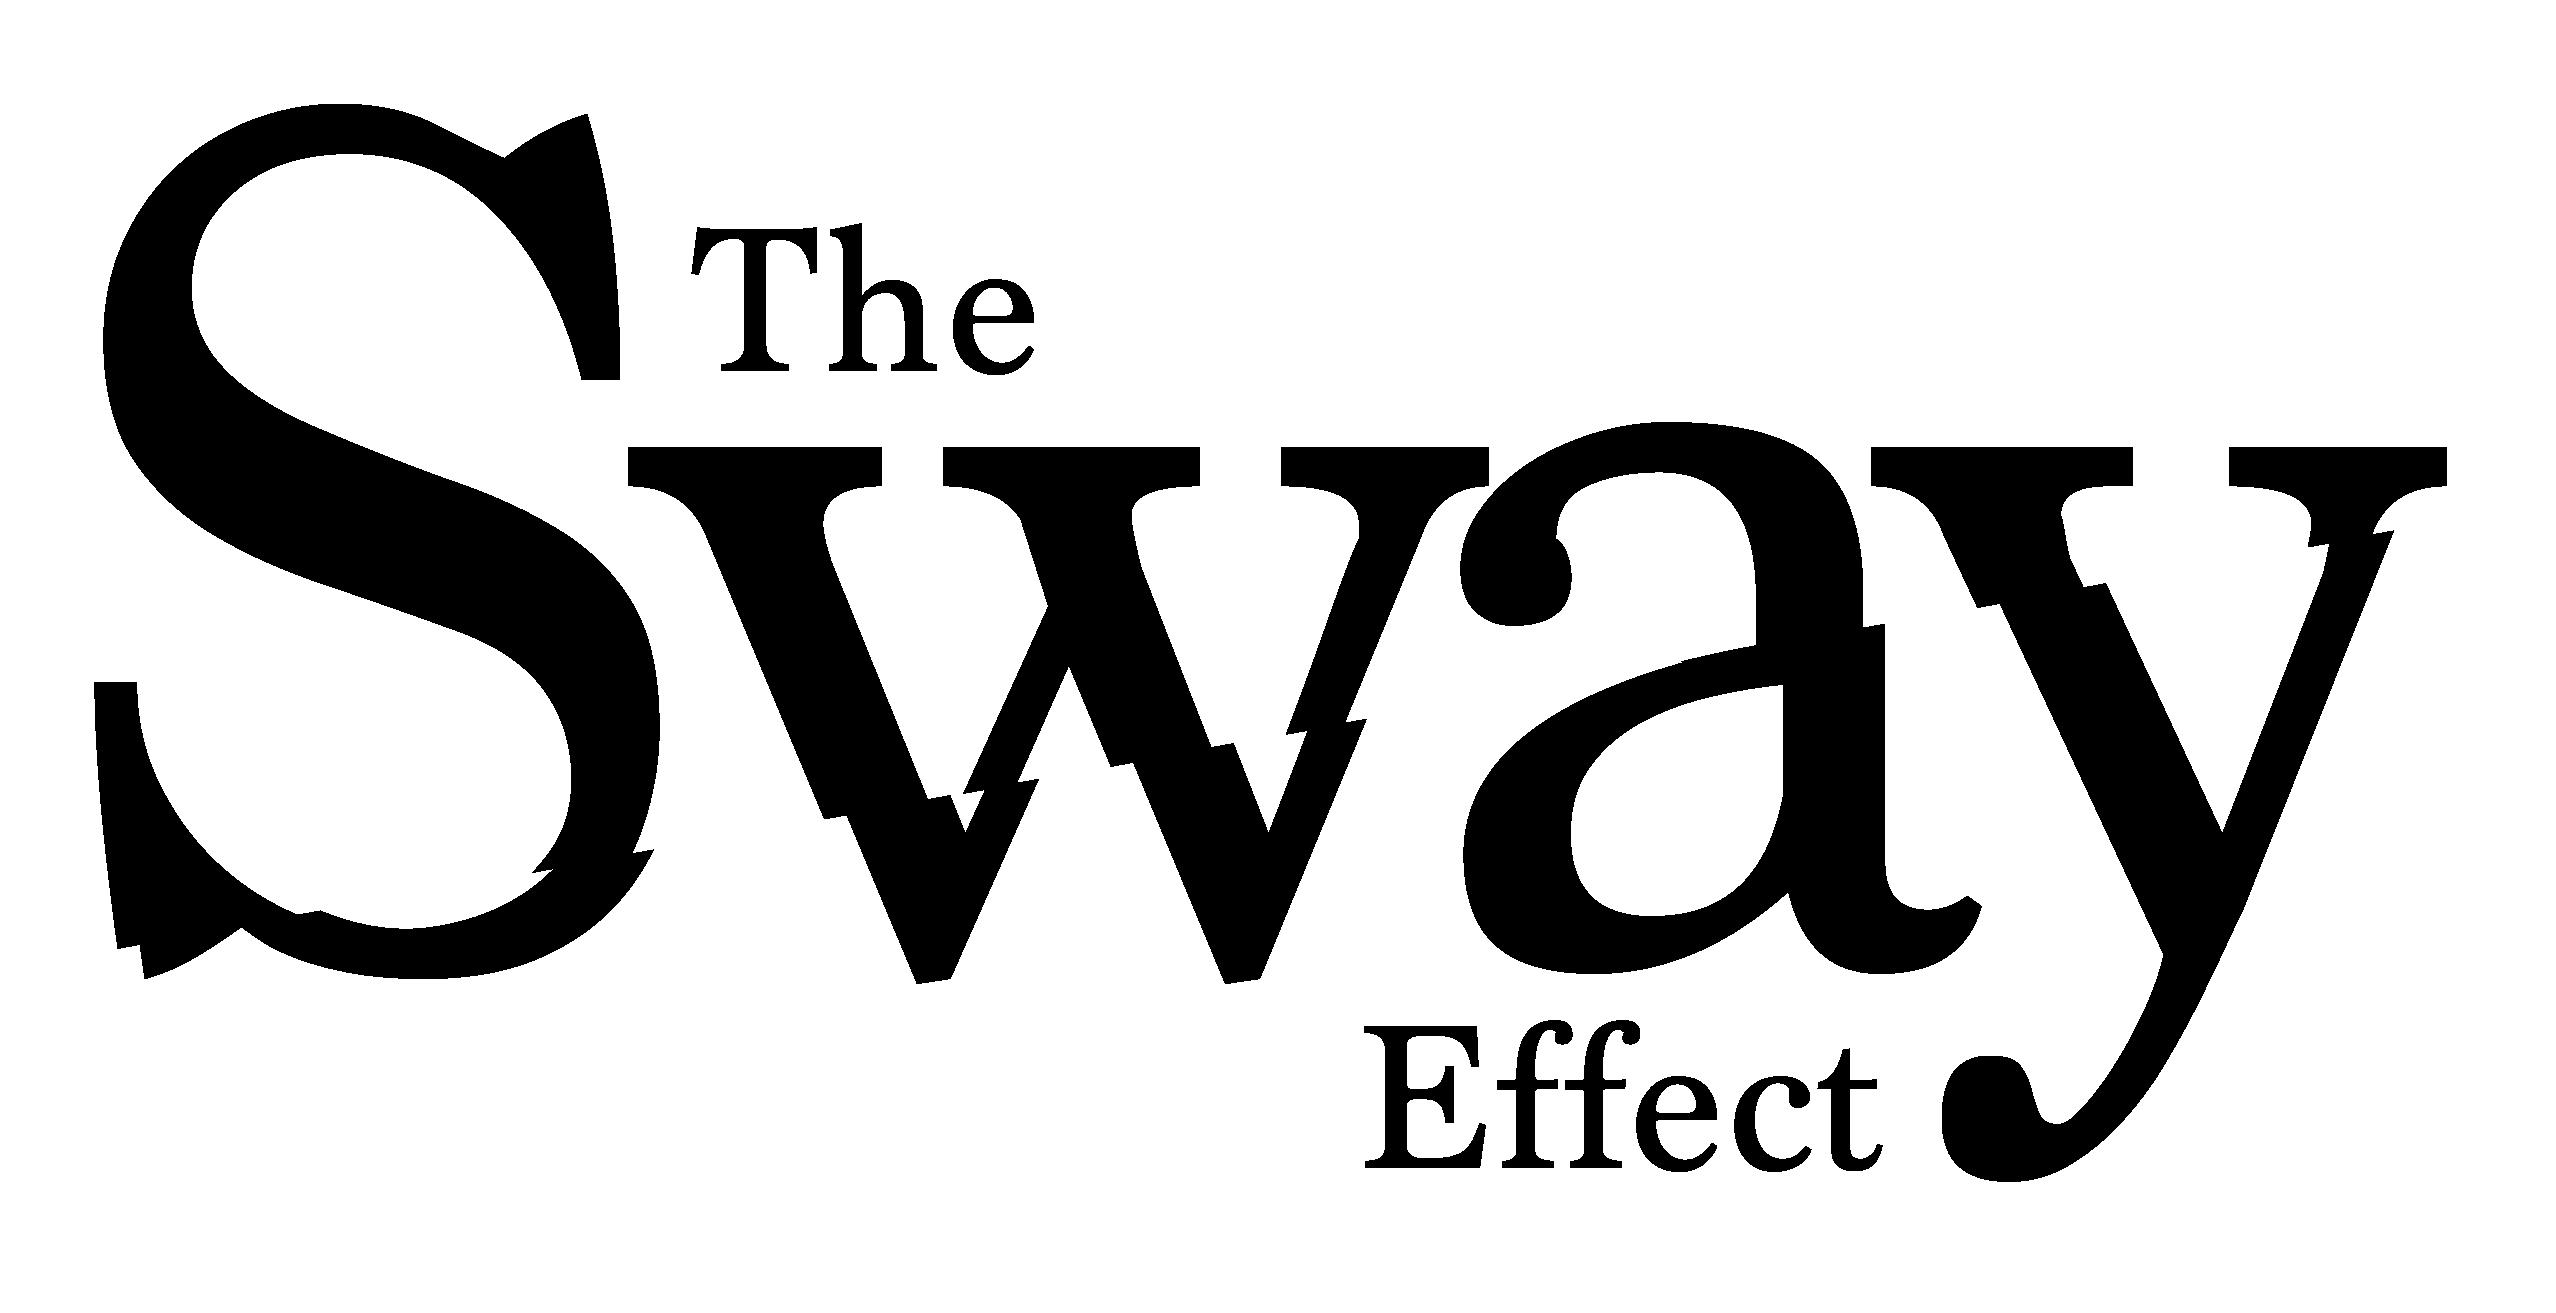 Sway logo